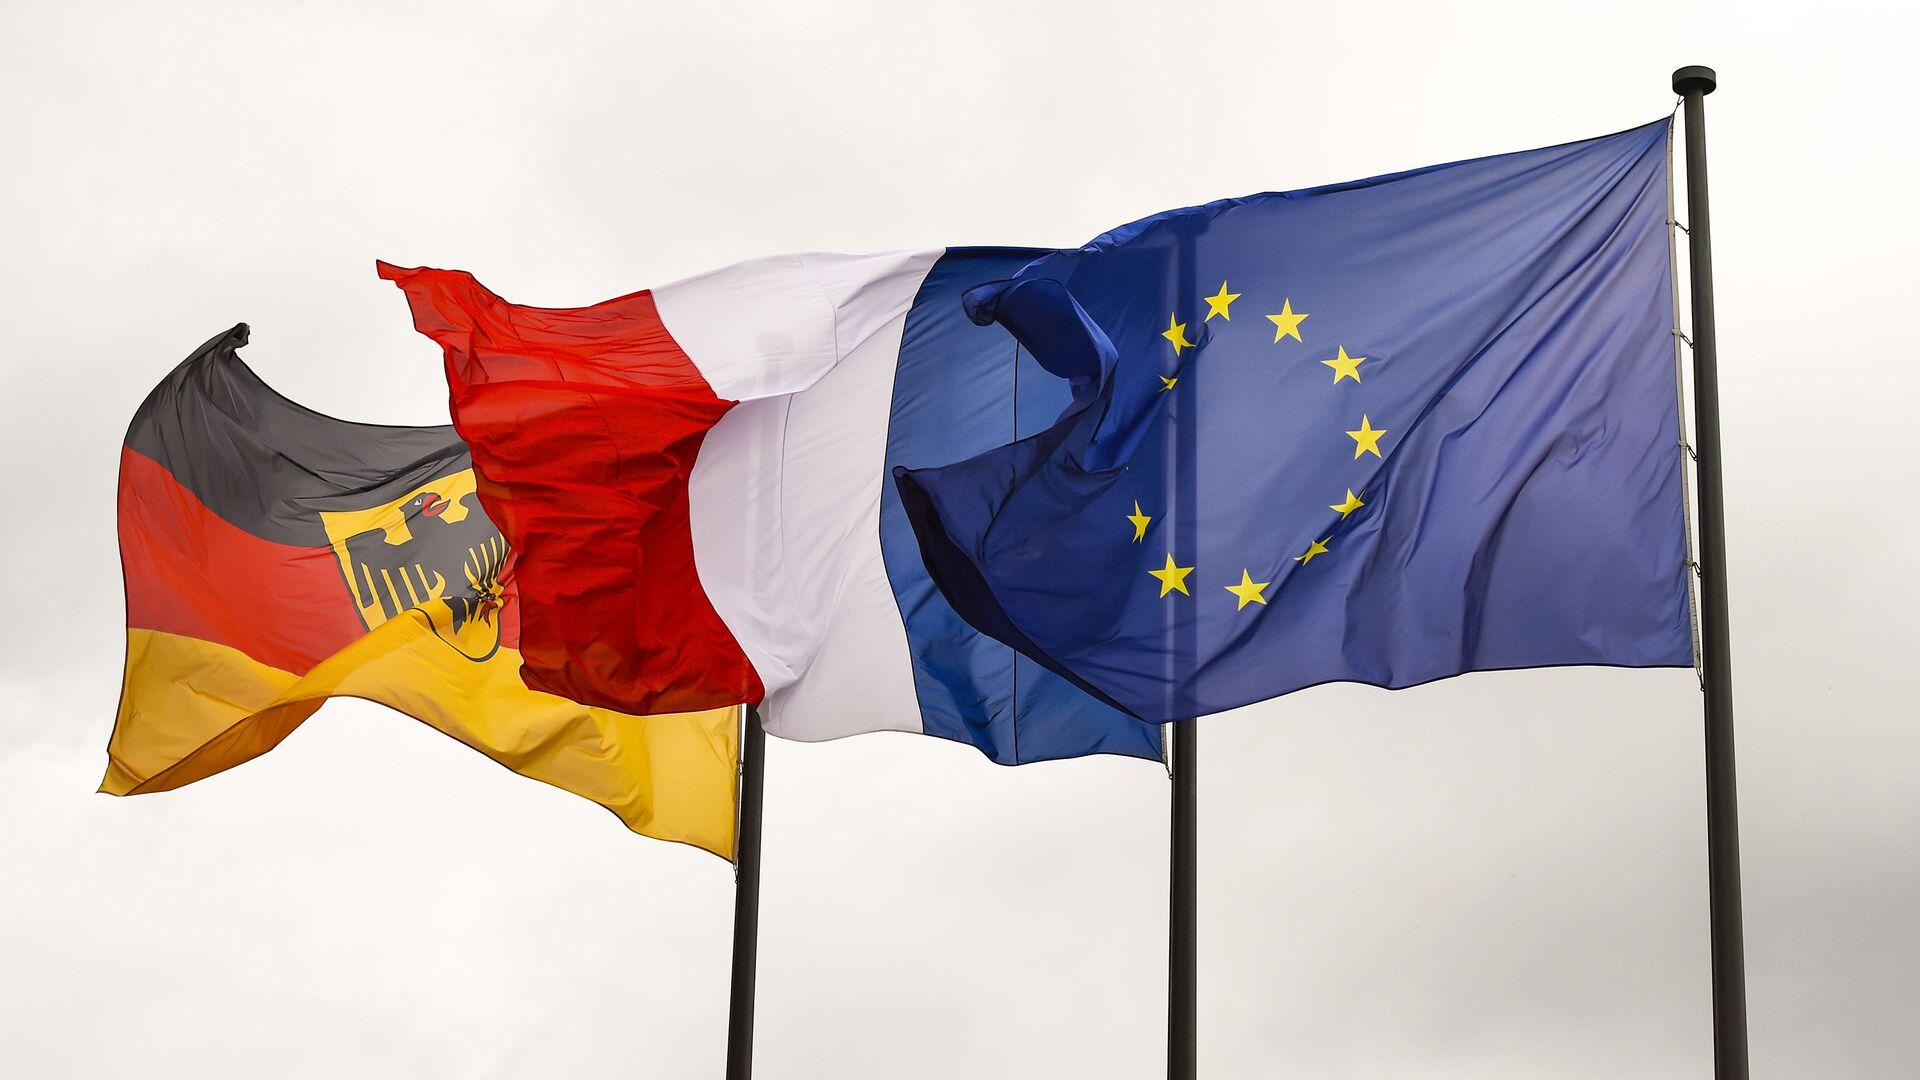 Flagi Niemiec, Francji i UE - Sputnik Polska, 1920, 09.10.2021